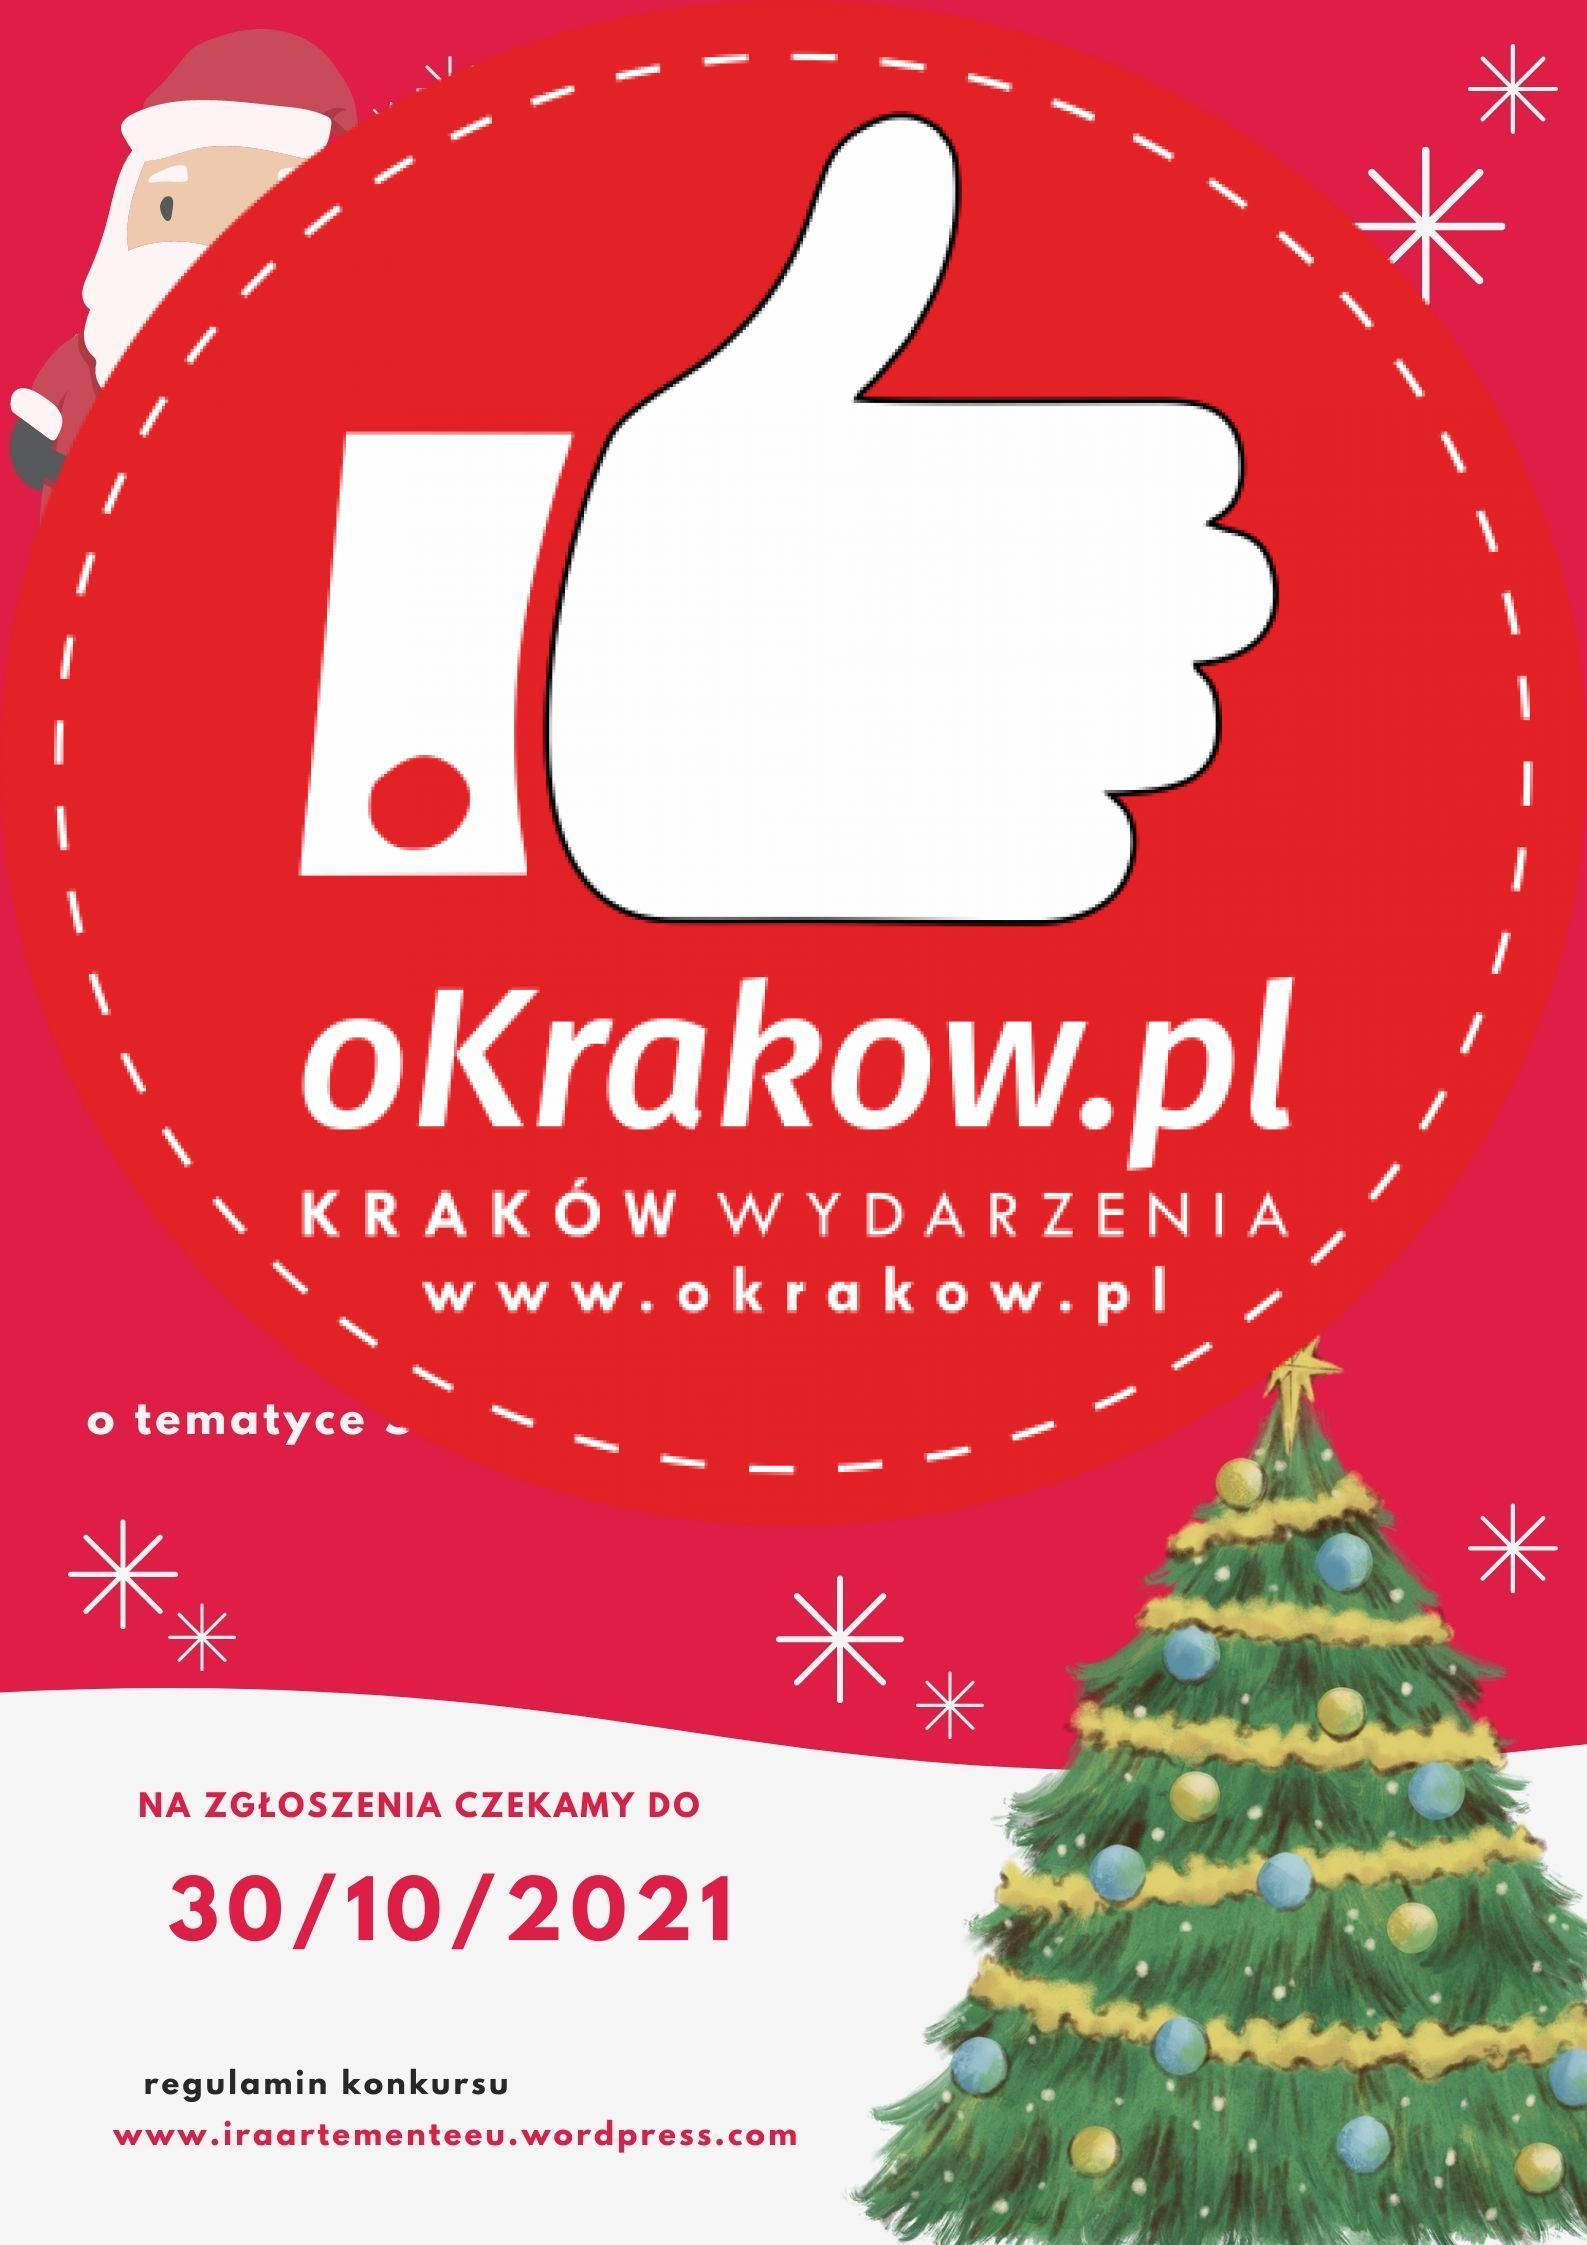 "konkurs merry christmas 2021 - Ogólnopolski Konkurs Poezji "" Merry Christmas 2021″"